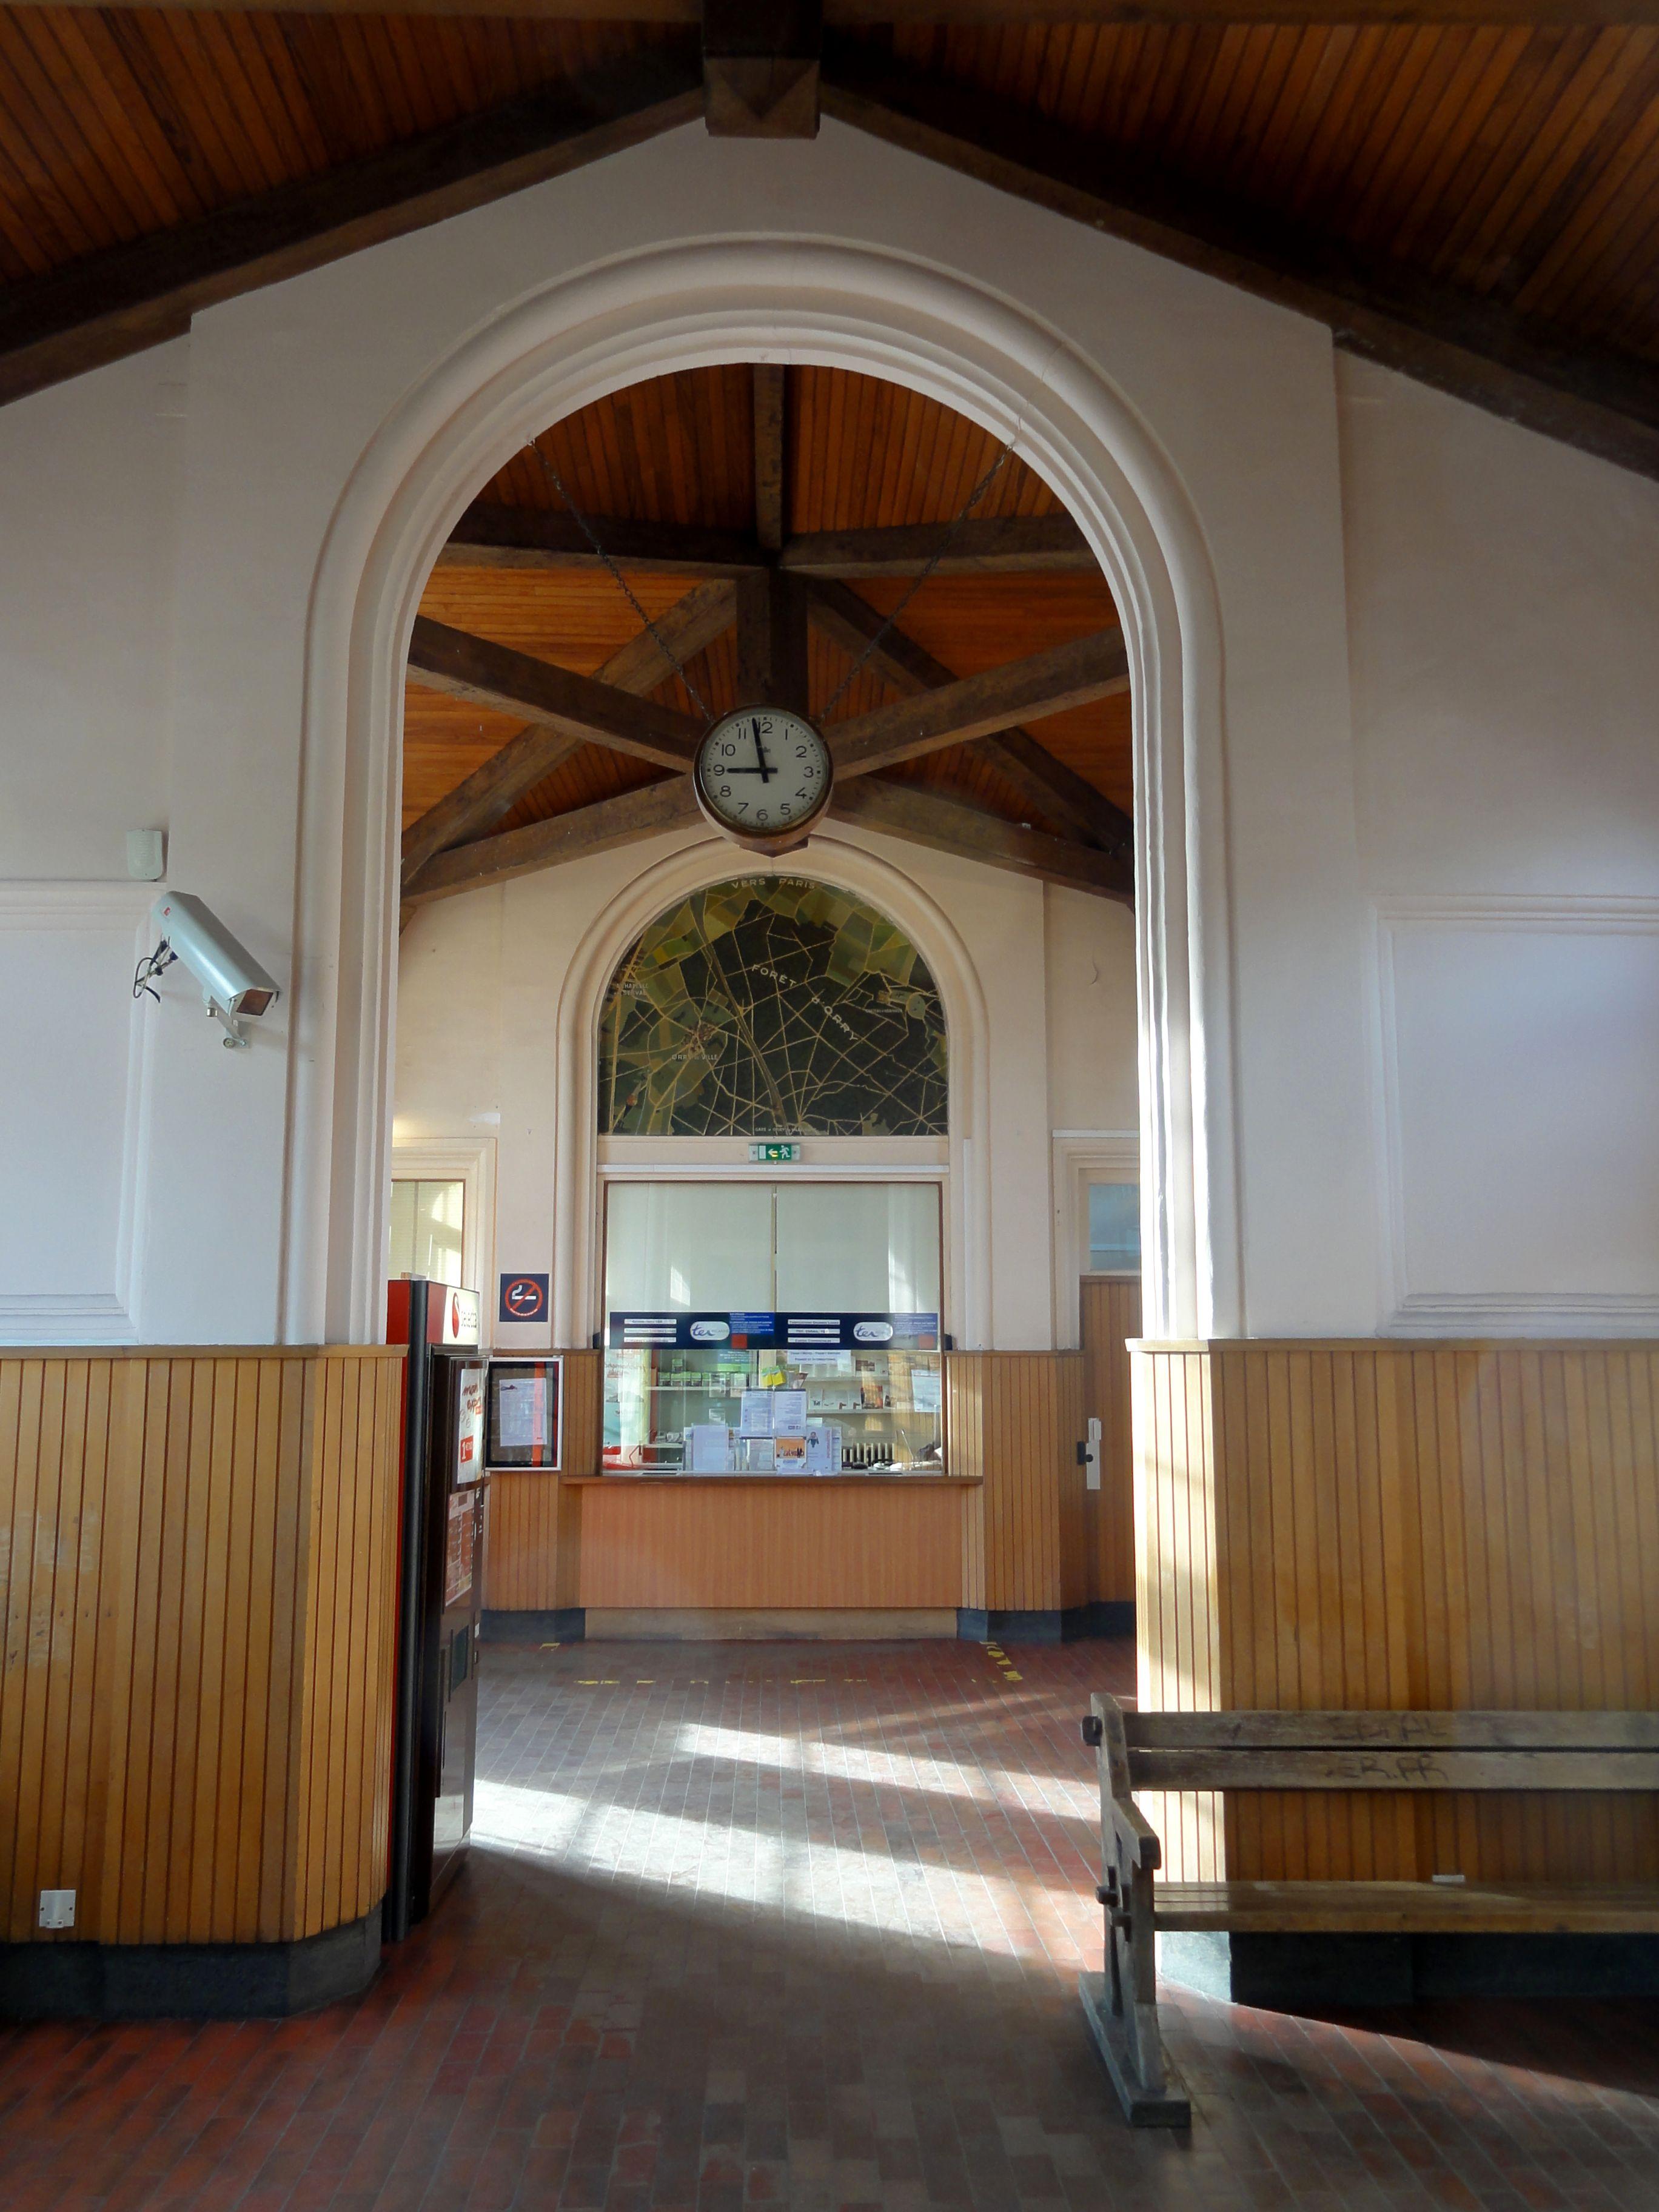 file orry la ville 60 gare d orry la ville coye salle d attente 2 jpg wikimedia commons